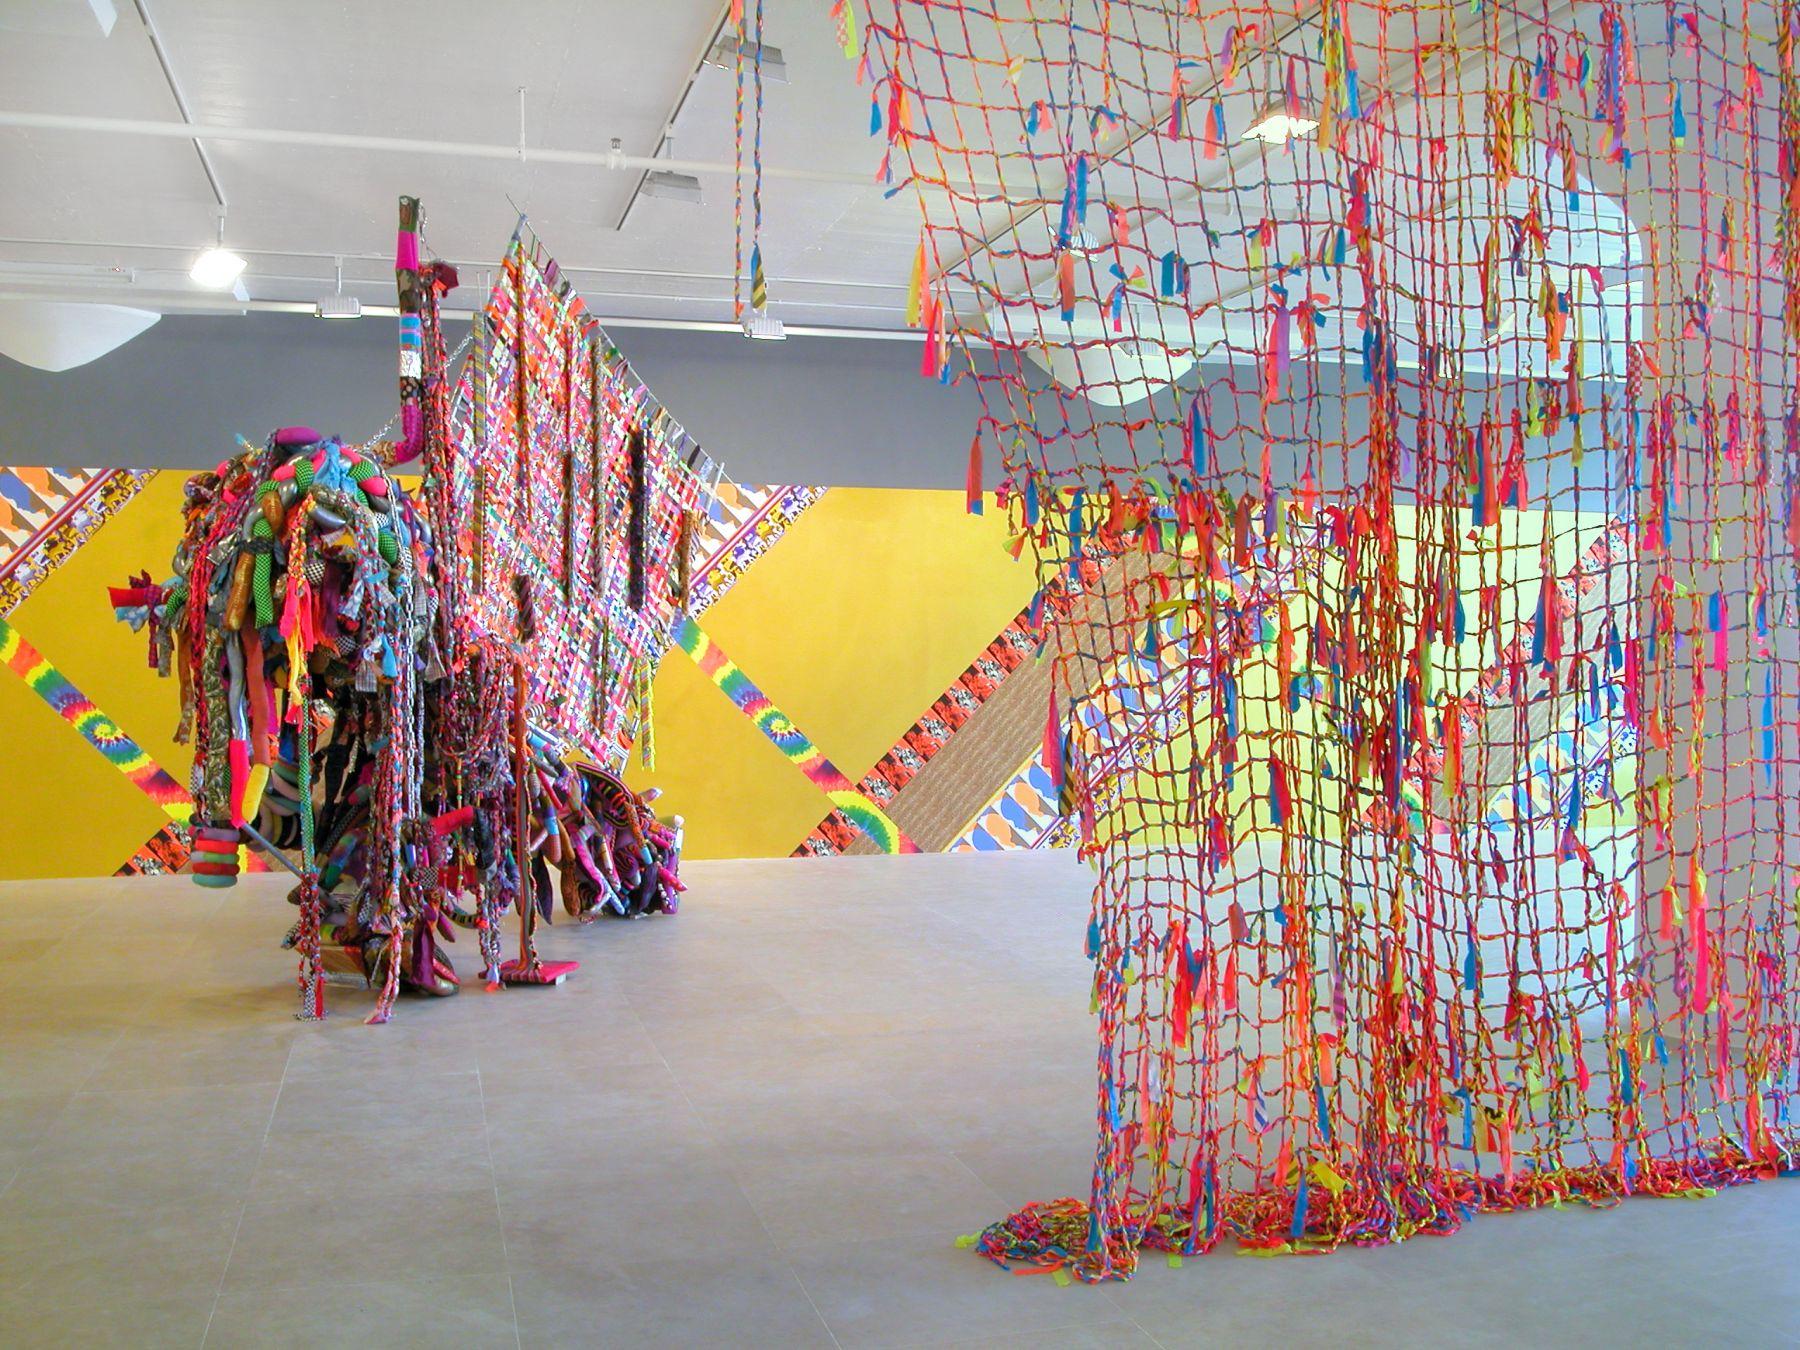 Jim Drain, Installation view, I Would Gnaw on My Hand, Greene Naftali, New York, 2007